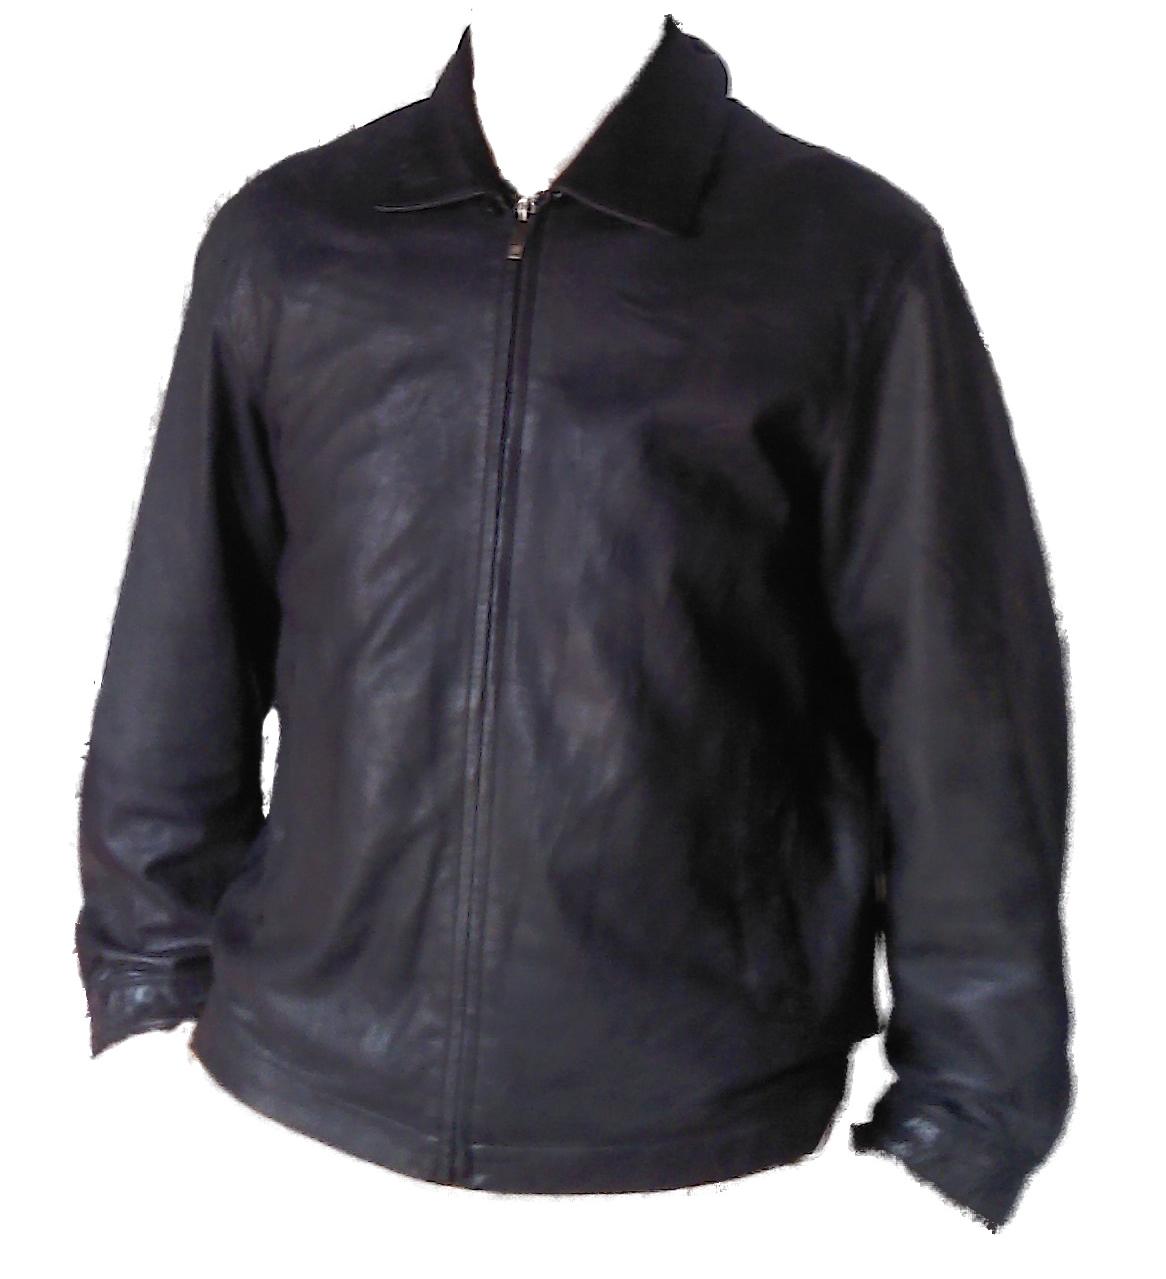 Jual Jaket Adidas Murah Jakarta - Long Sweater Jacket